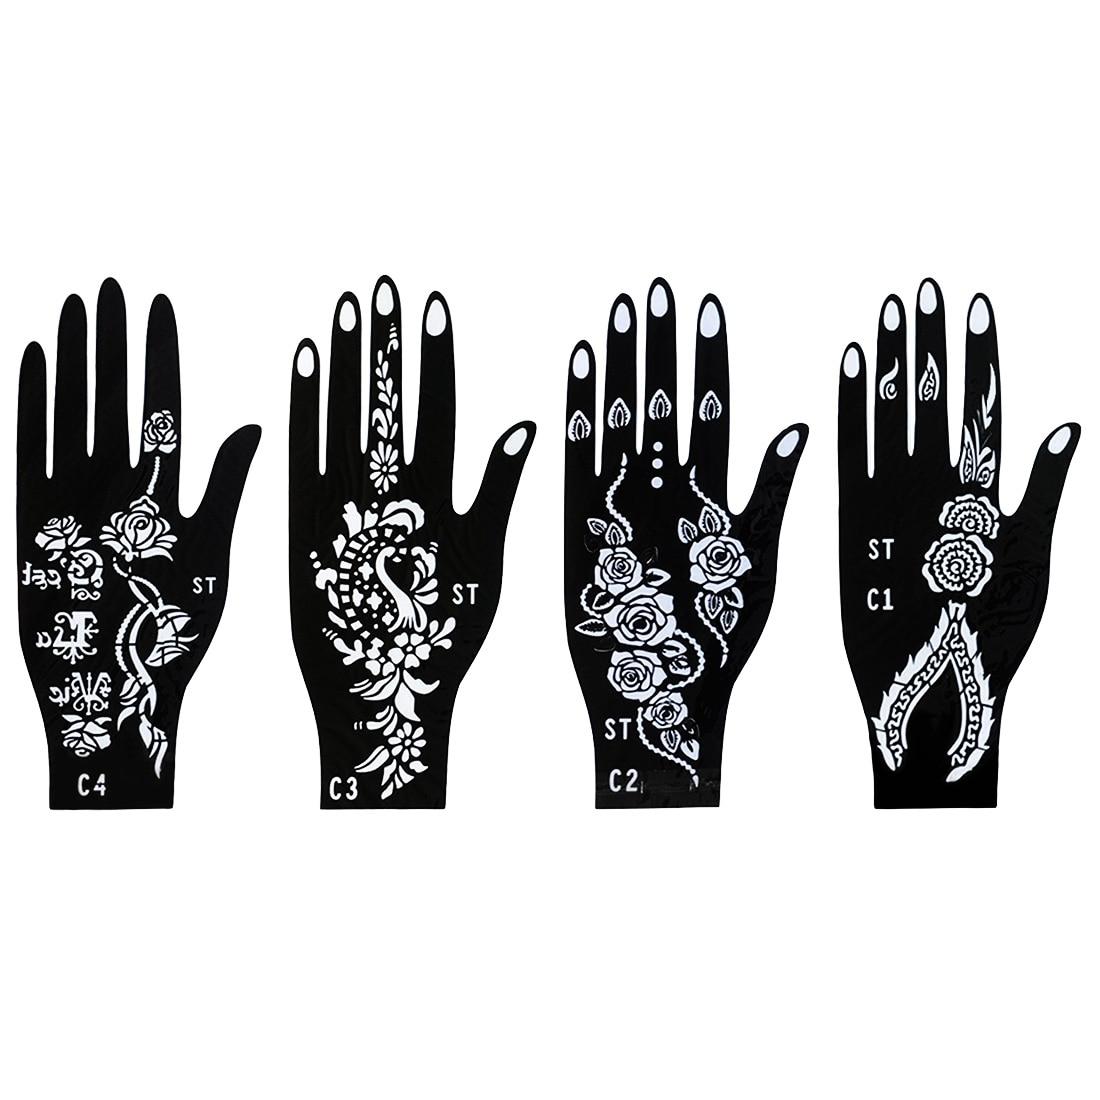 Henna Tattoo Palm Template India Nepal Bloem Kant Vinger Dek Schimmel Flash Spuitpistool Vrouwelijke Hand Verf Mehndi Tattoo Sjabloon